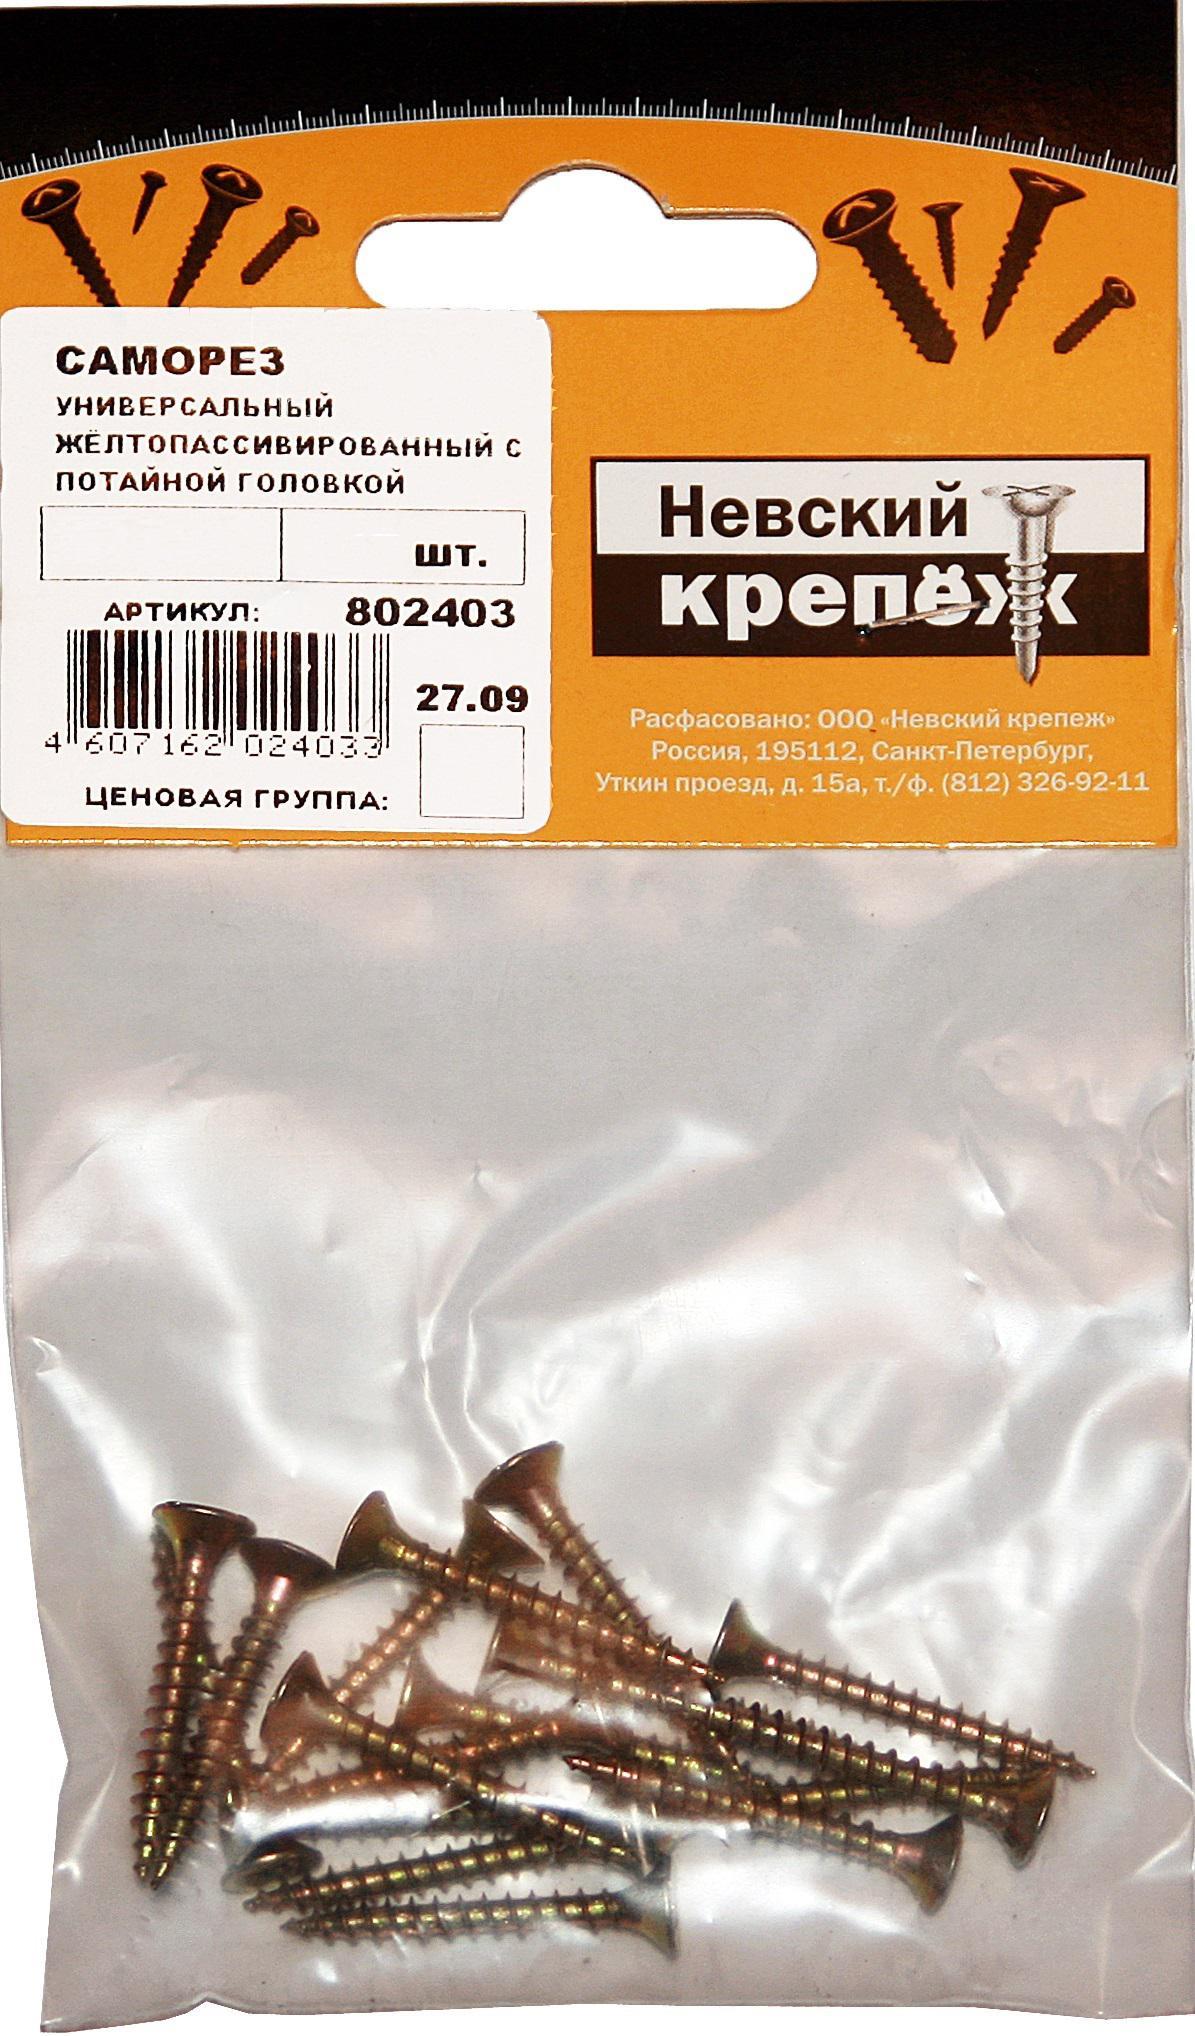 Саморез НЕВСКИЙ КРЕПЕЖ 802389